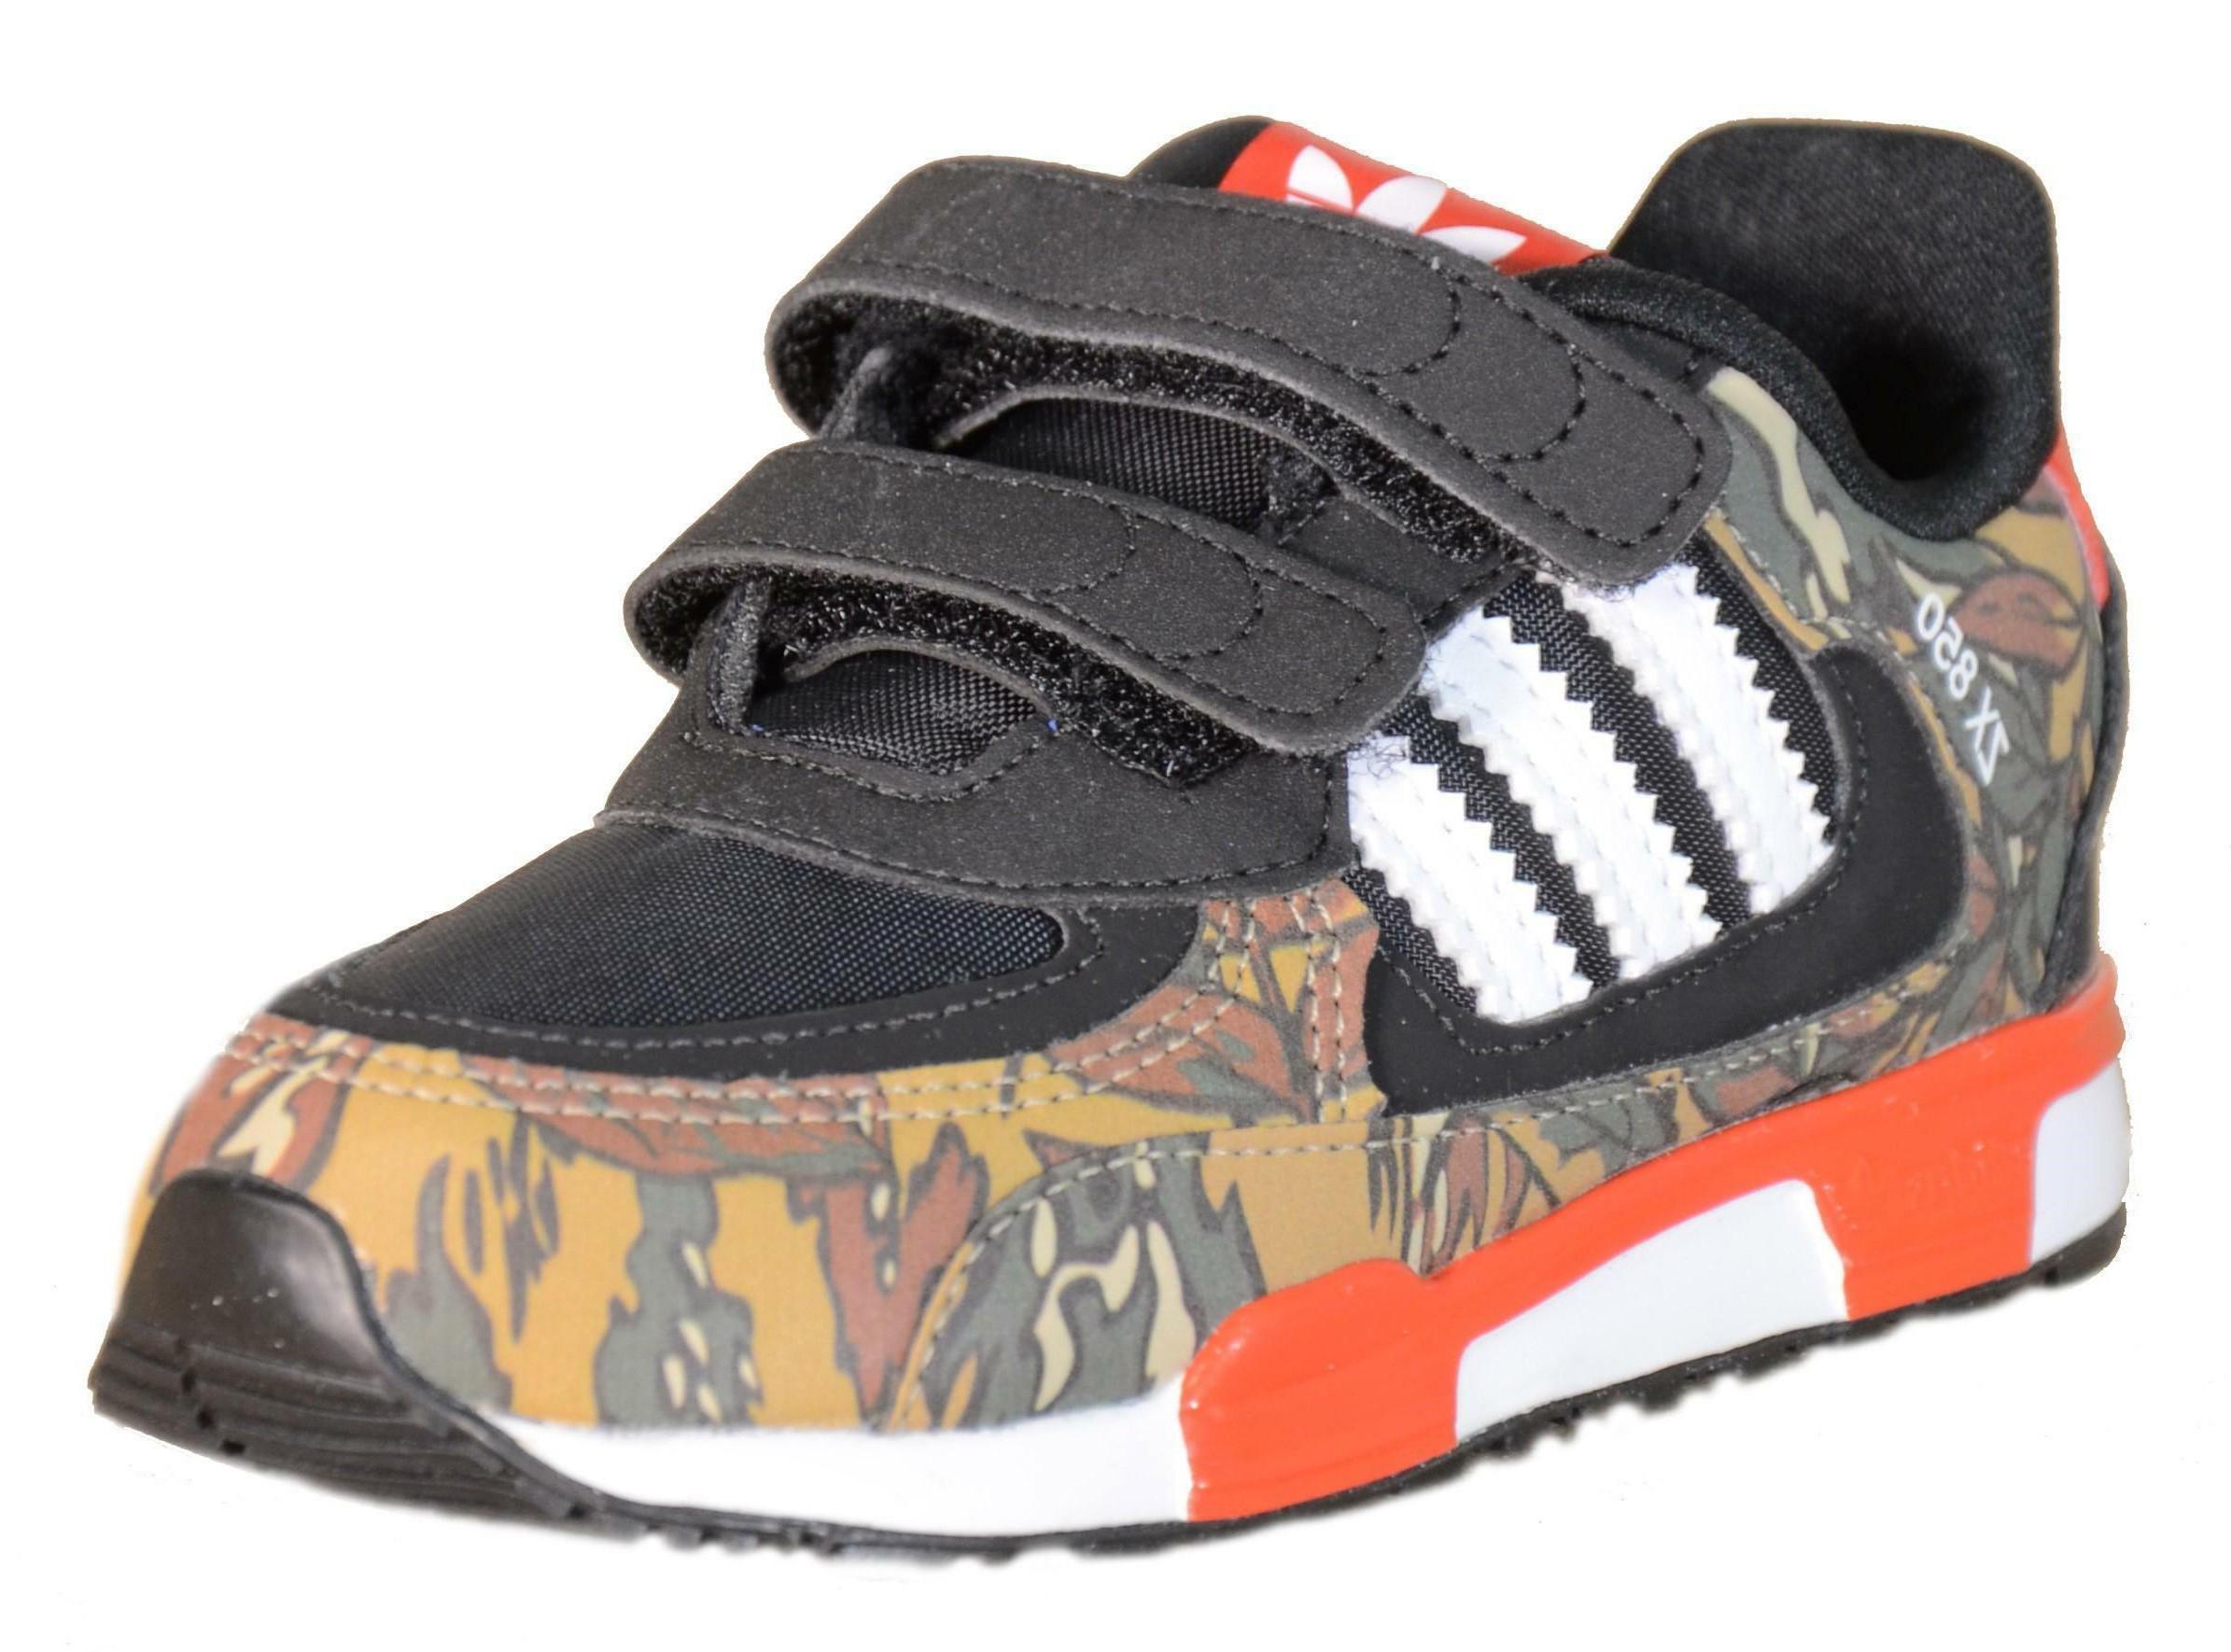 scarpe adidas zx 850 grigie